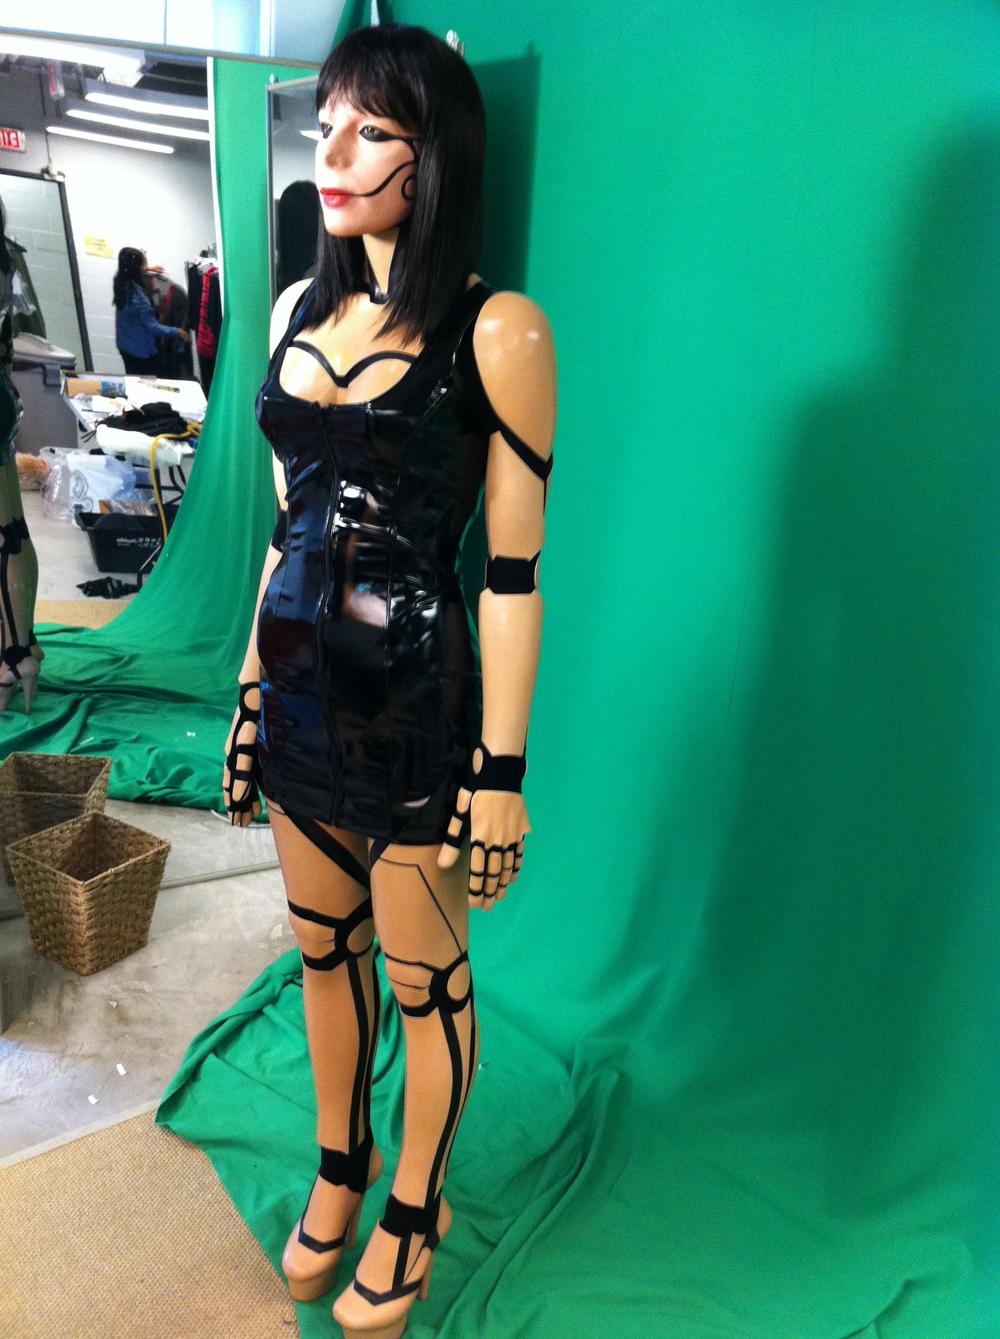 Total Recall (2012) - 'Sexbot' costume